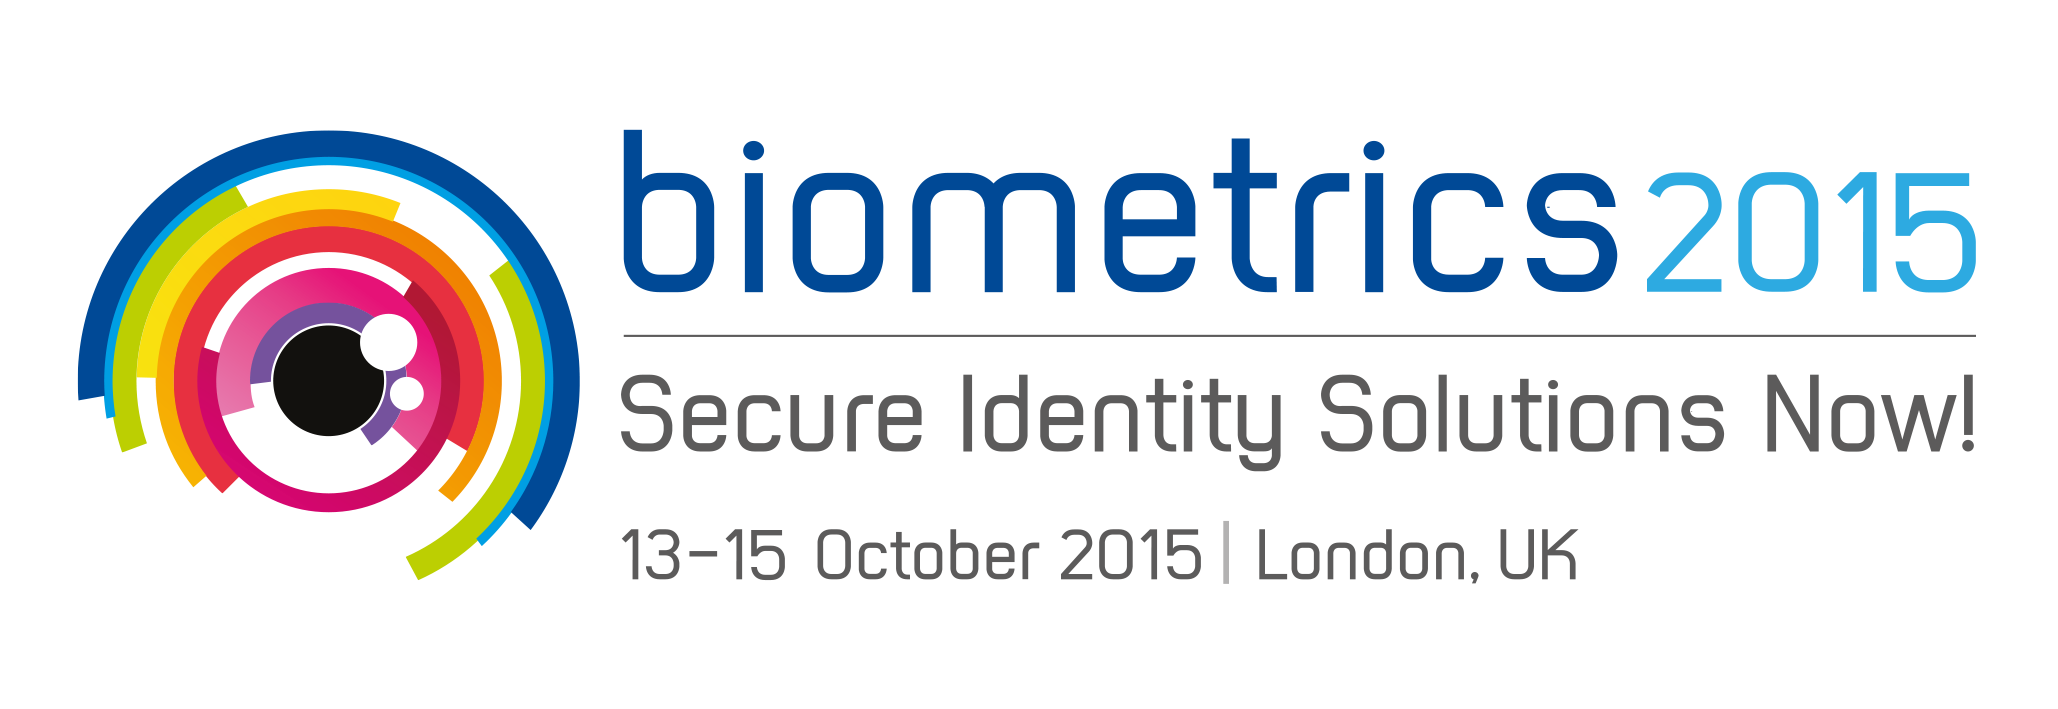 Gradiant - Biometría - Biometrics 2015 Londres